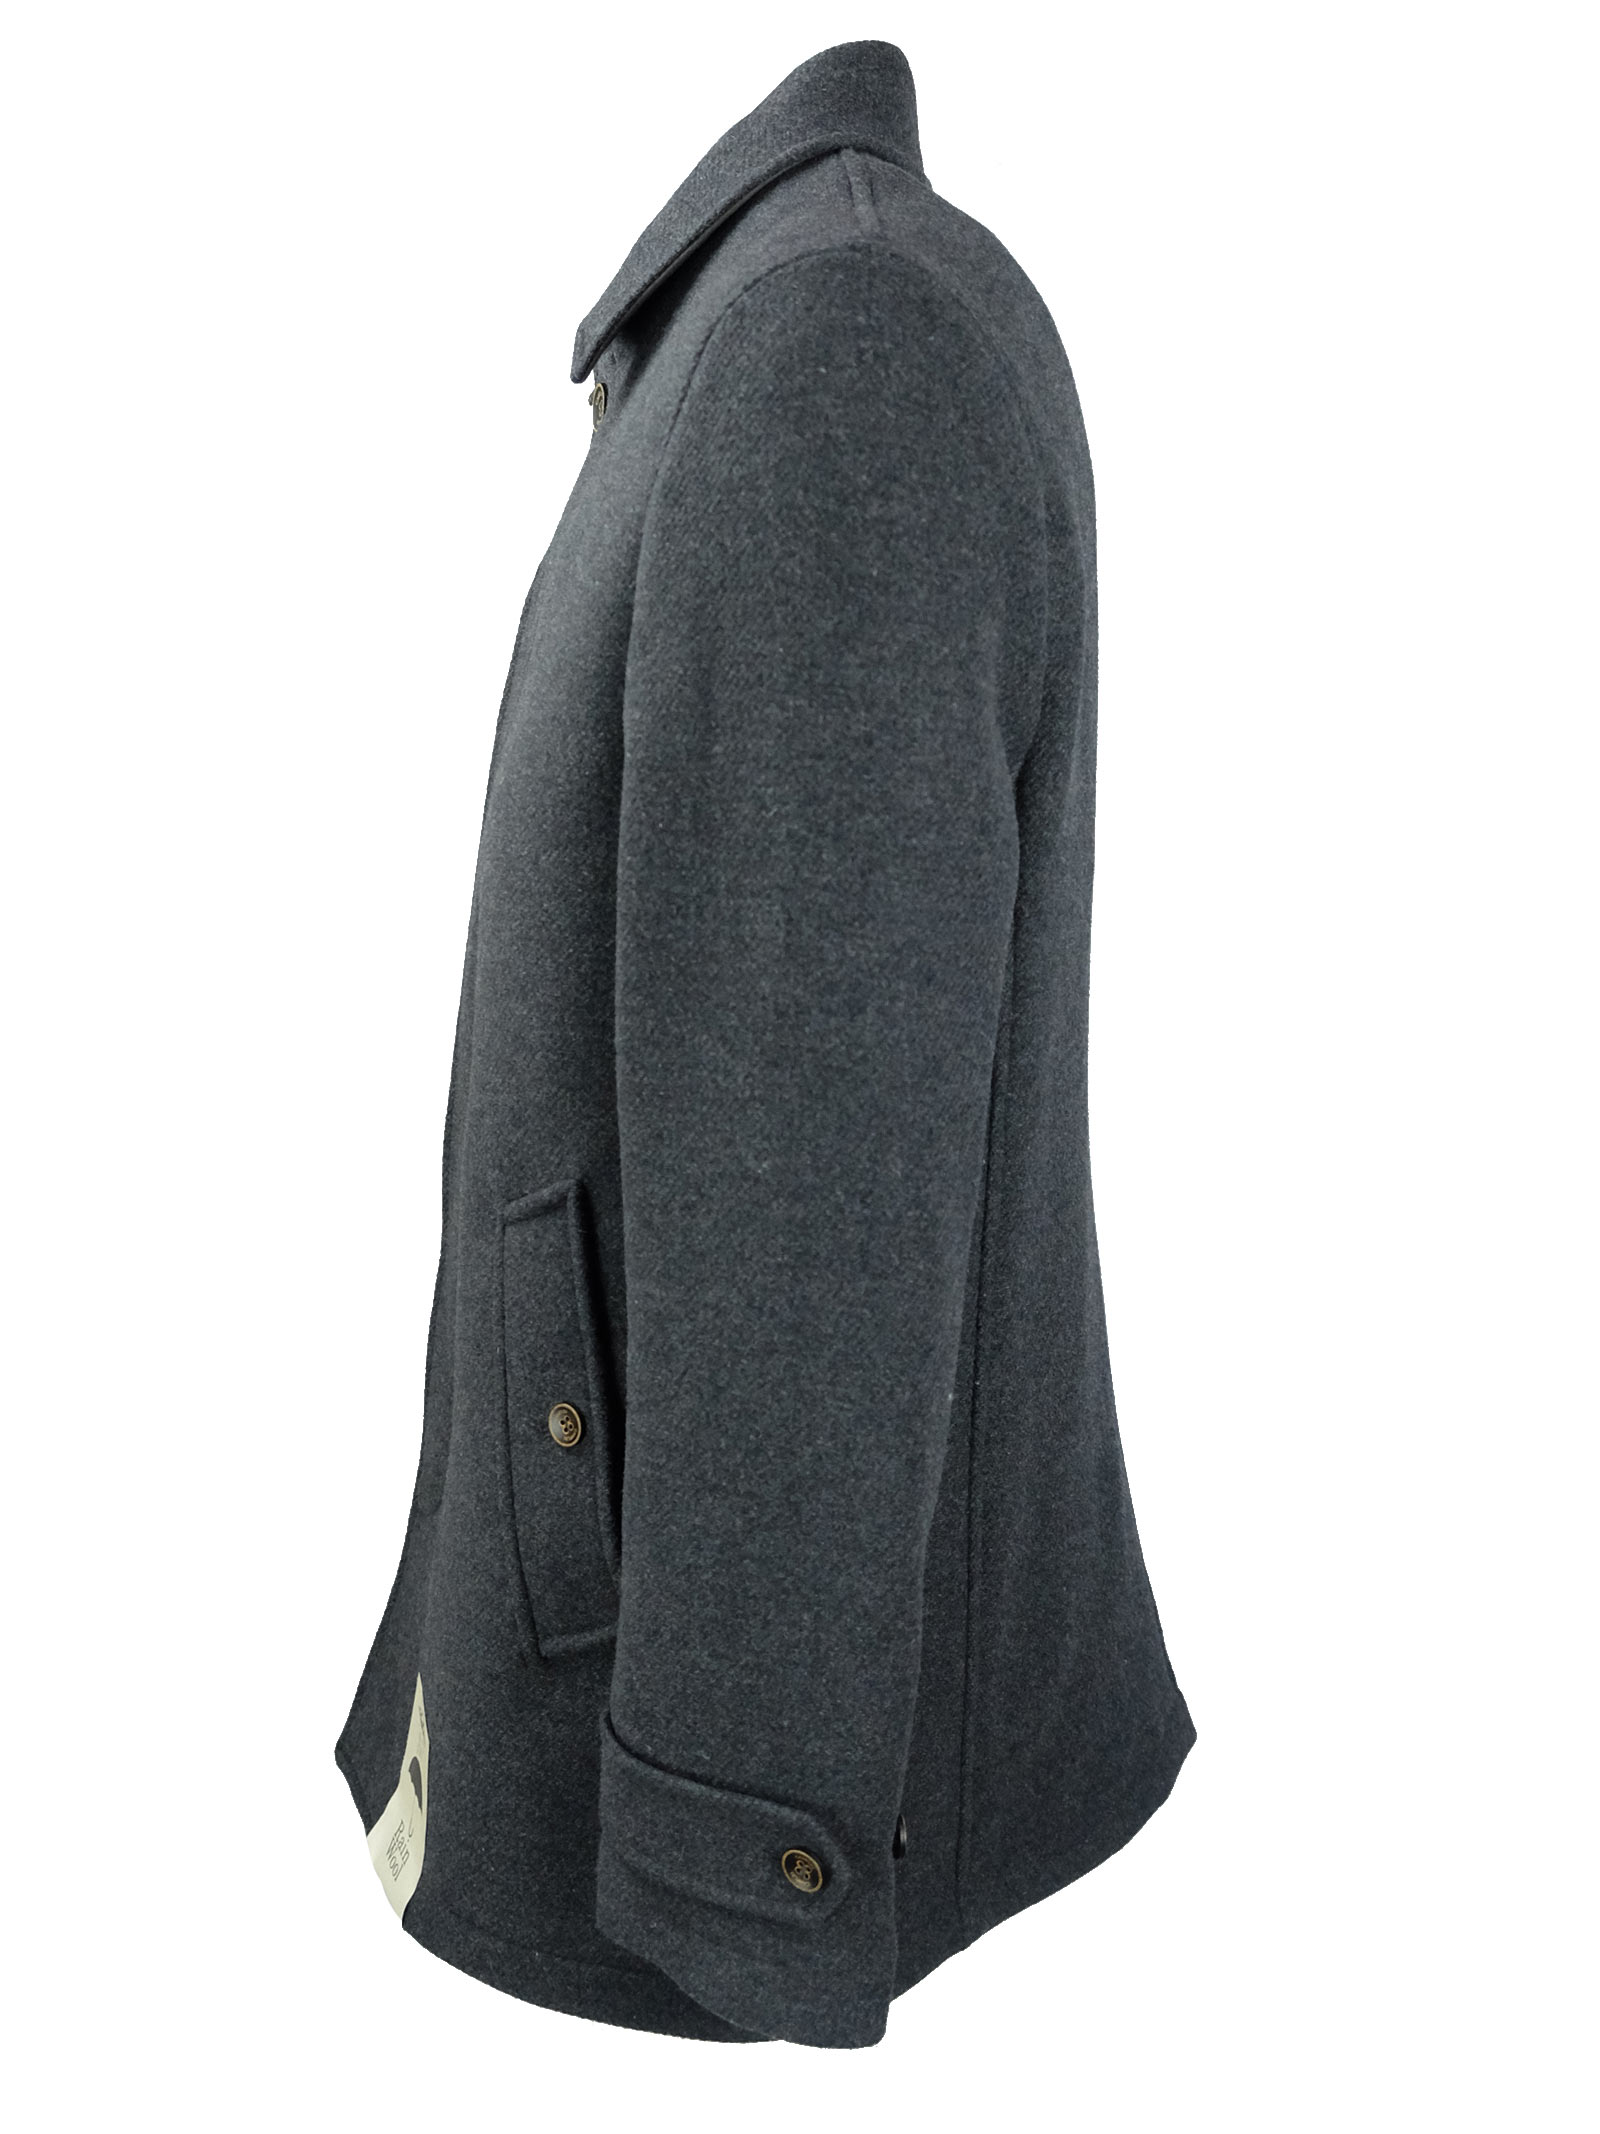 Giaccone in lana CAMPLIN | Giacconi | OVER COAT NORTHGL